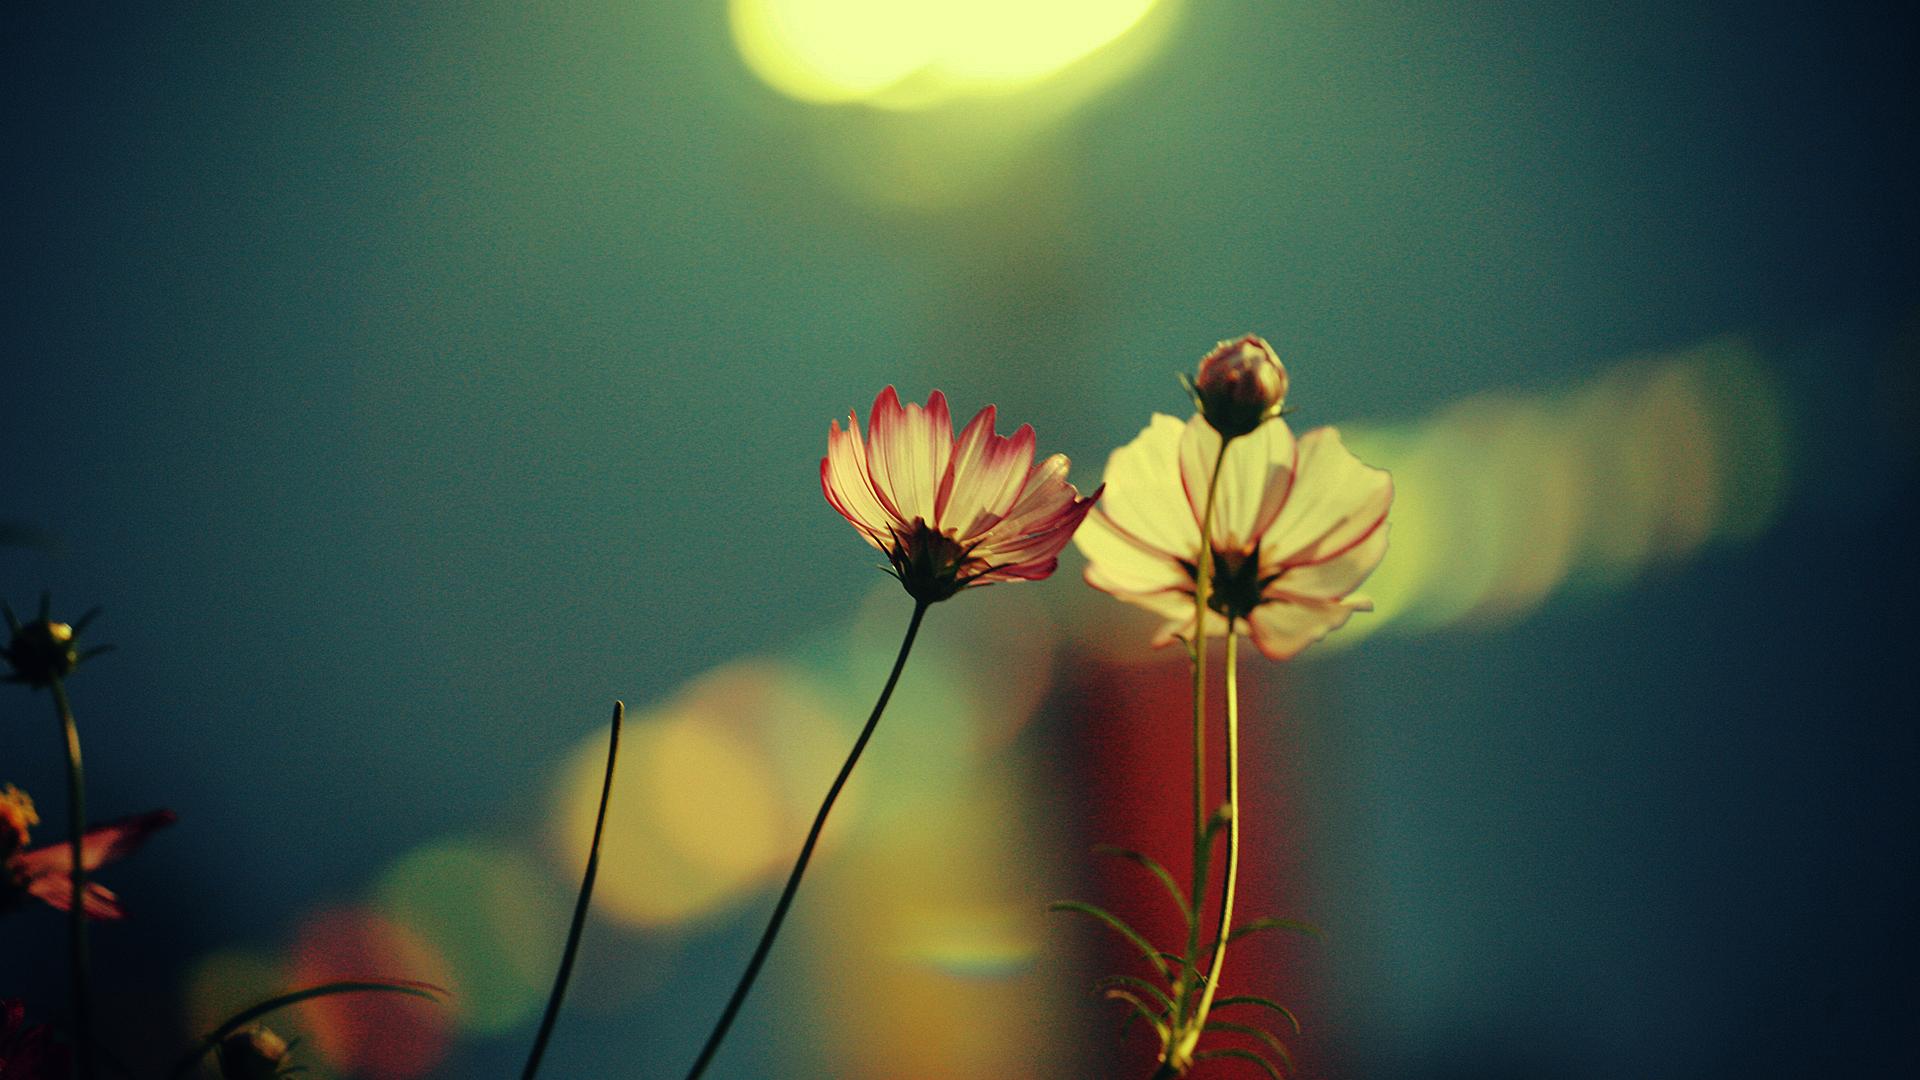 25 Beautiful Flowers Full HD Wallpapers 1920X1080 1920x1080